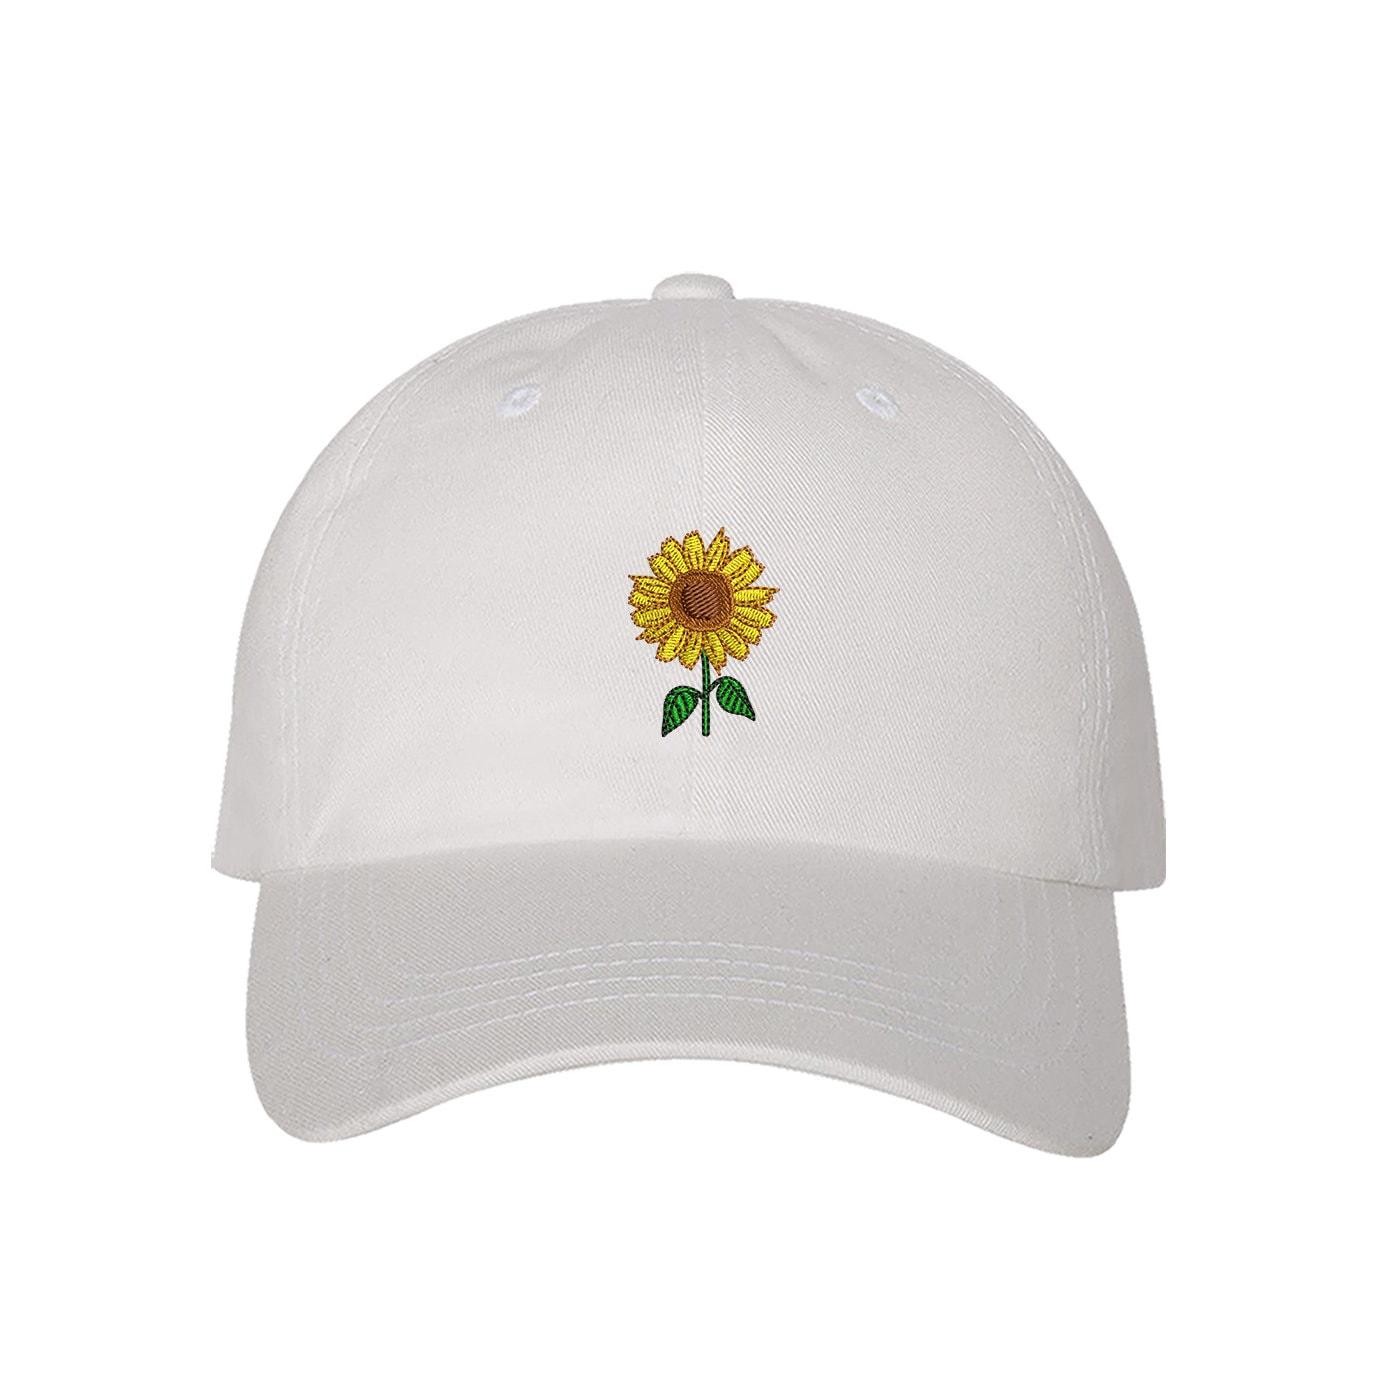 SUNFLOWER Hats Embroidered Cap  c3531d96fbc9